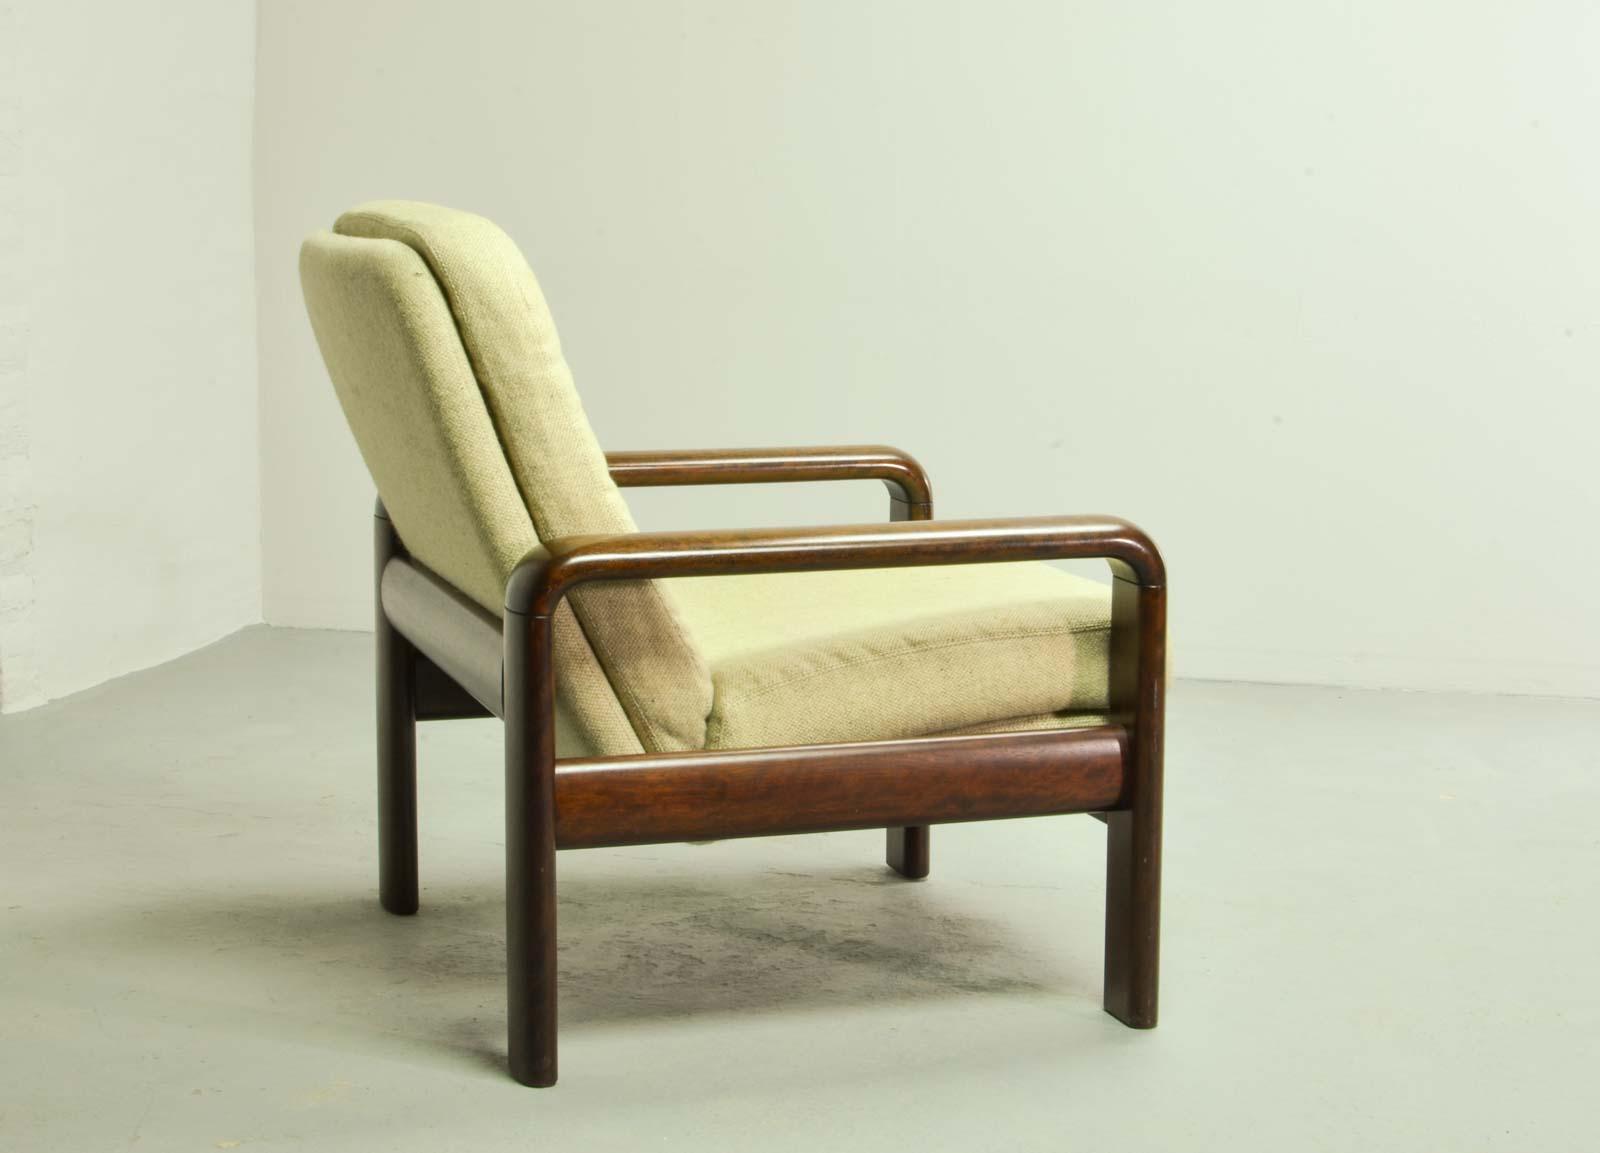 chair design scandinavian folding picture dyrlund shortback lounge 1960s